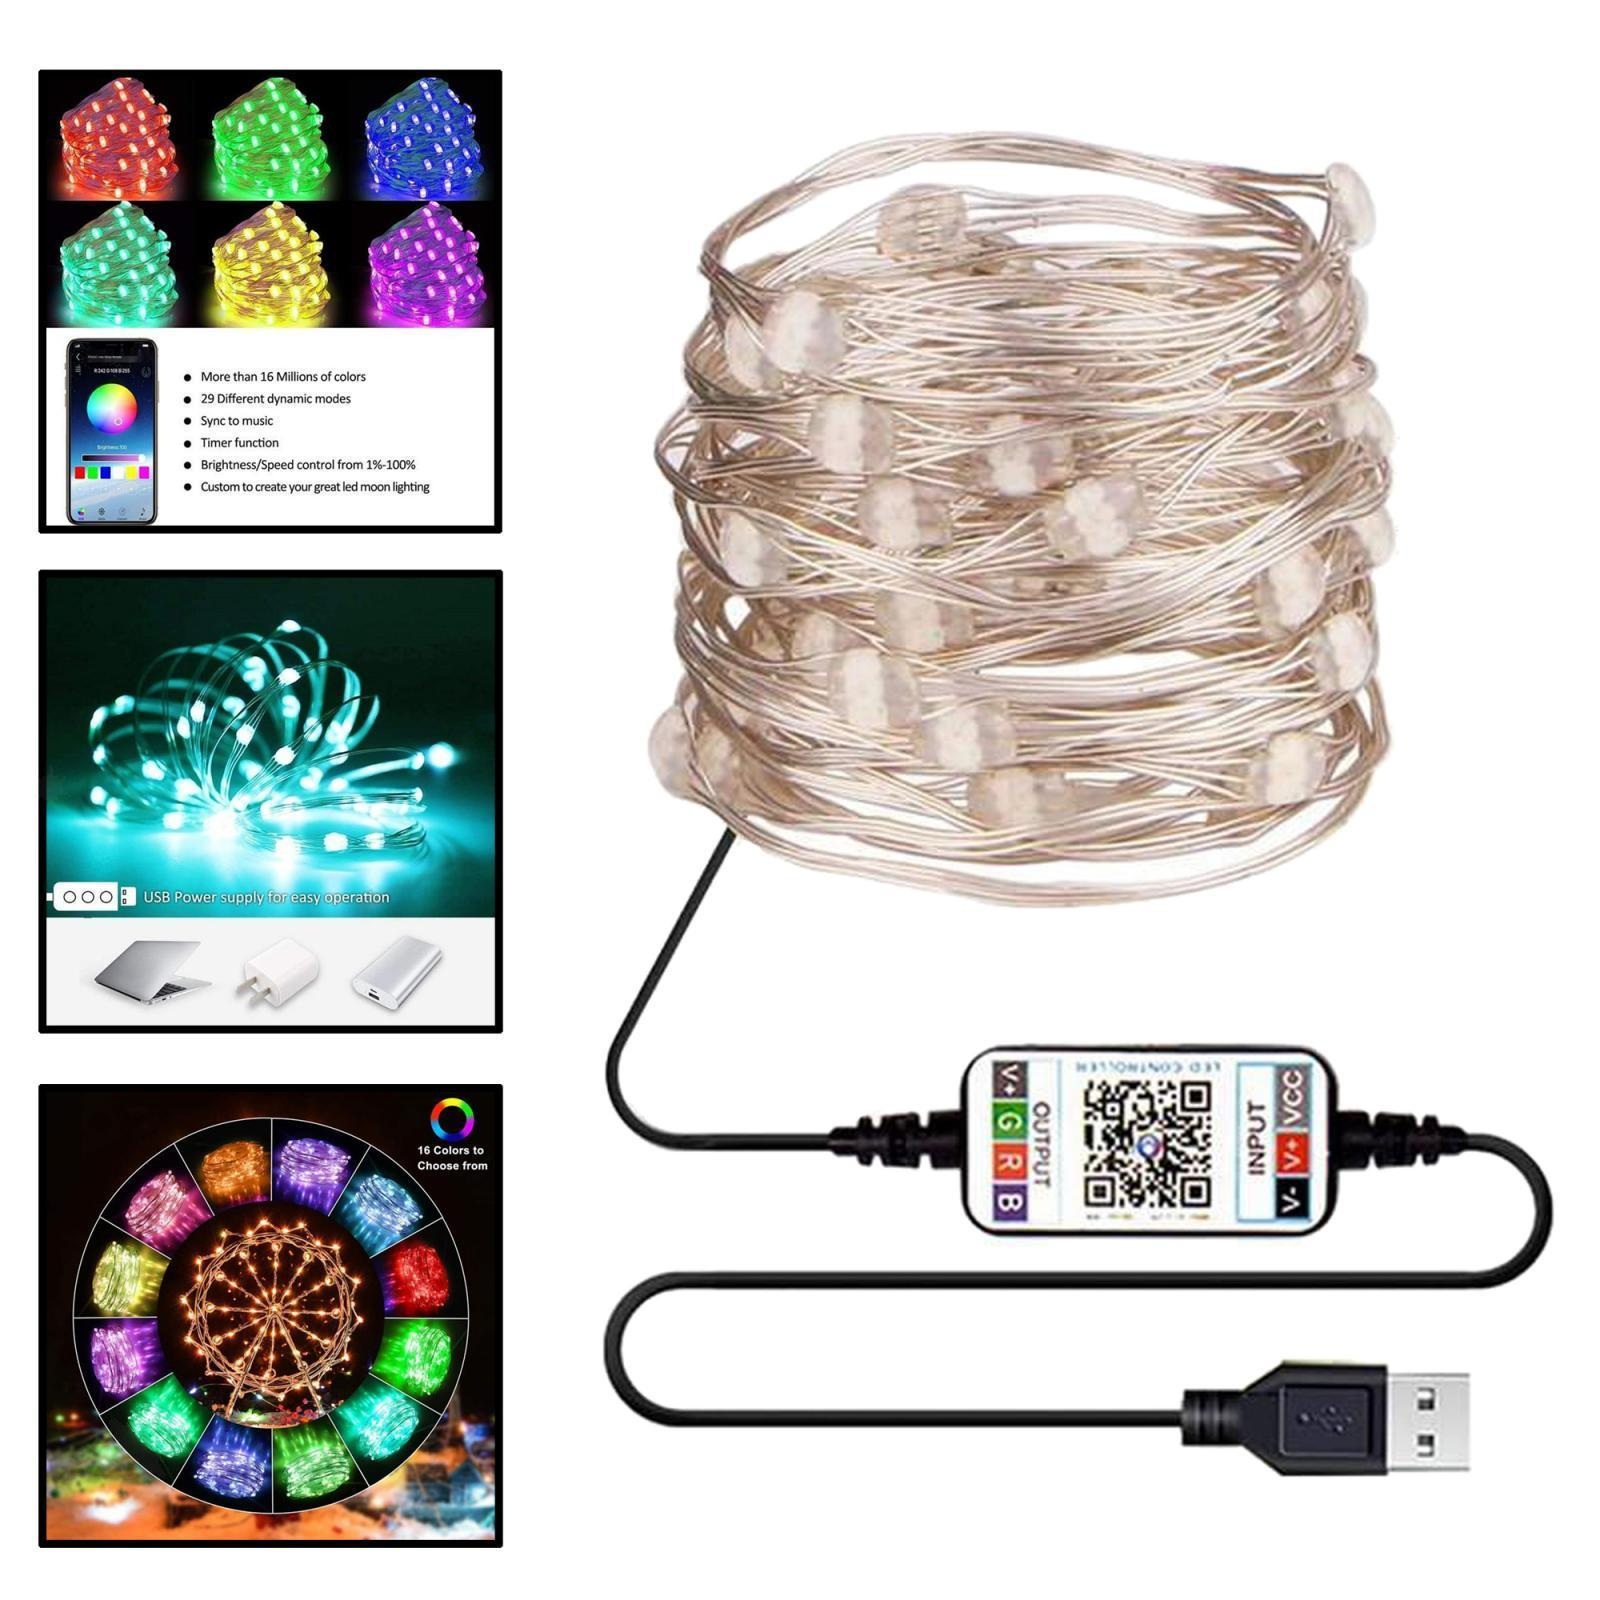 miniature 20 - LED Fée Guirlande Lumineuse Rideau Fenêtre De Mariage Party Decor App Contrôl